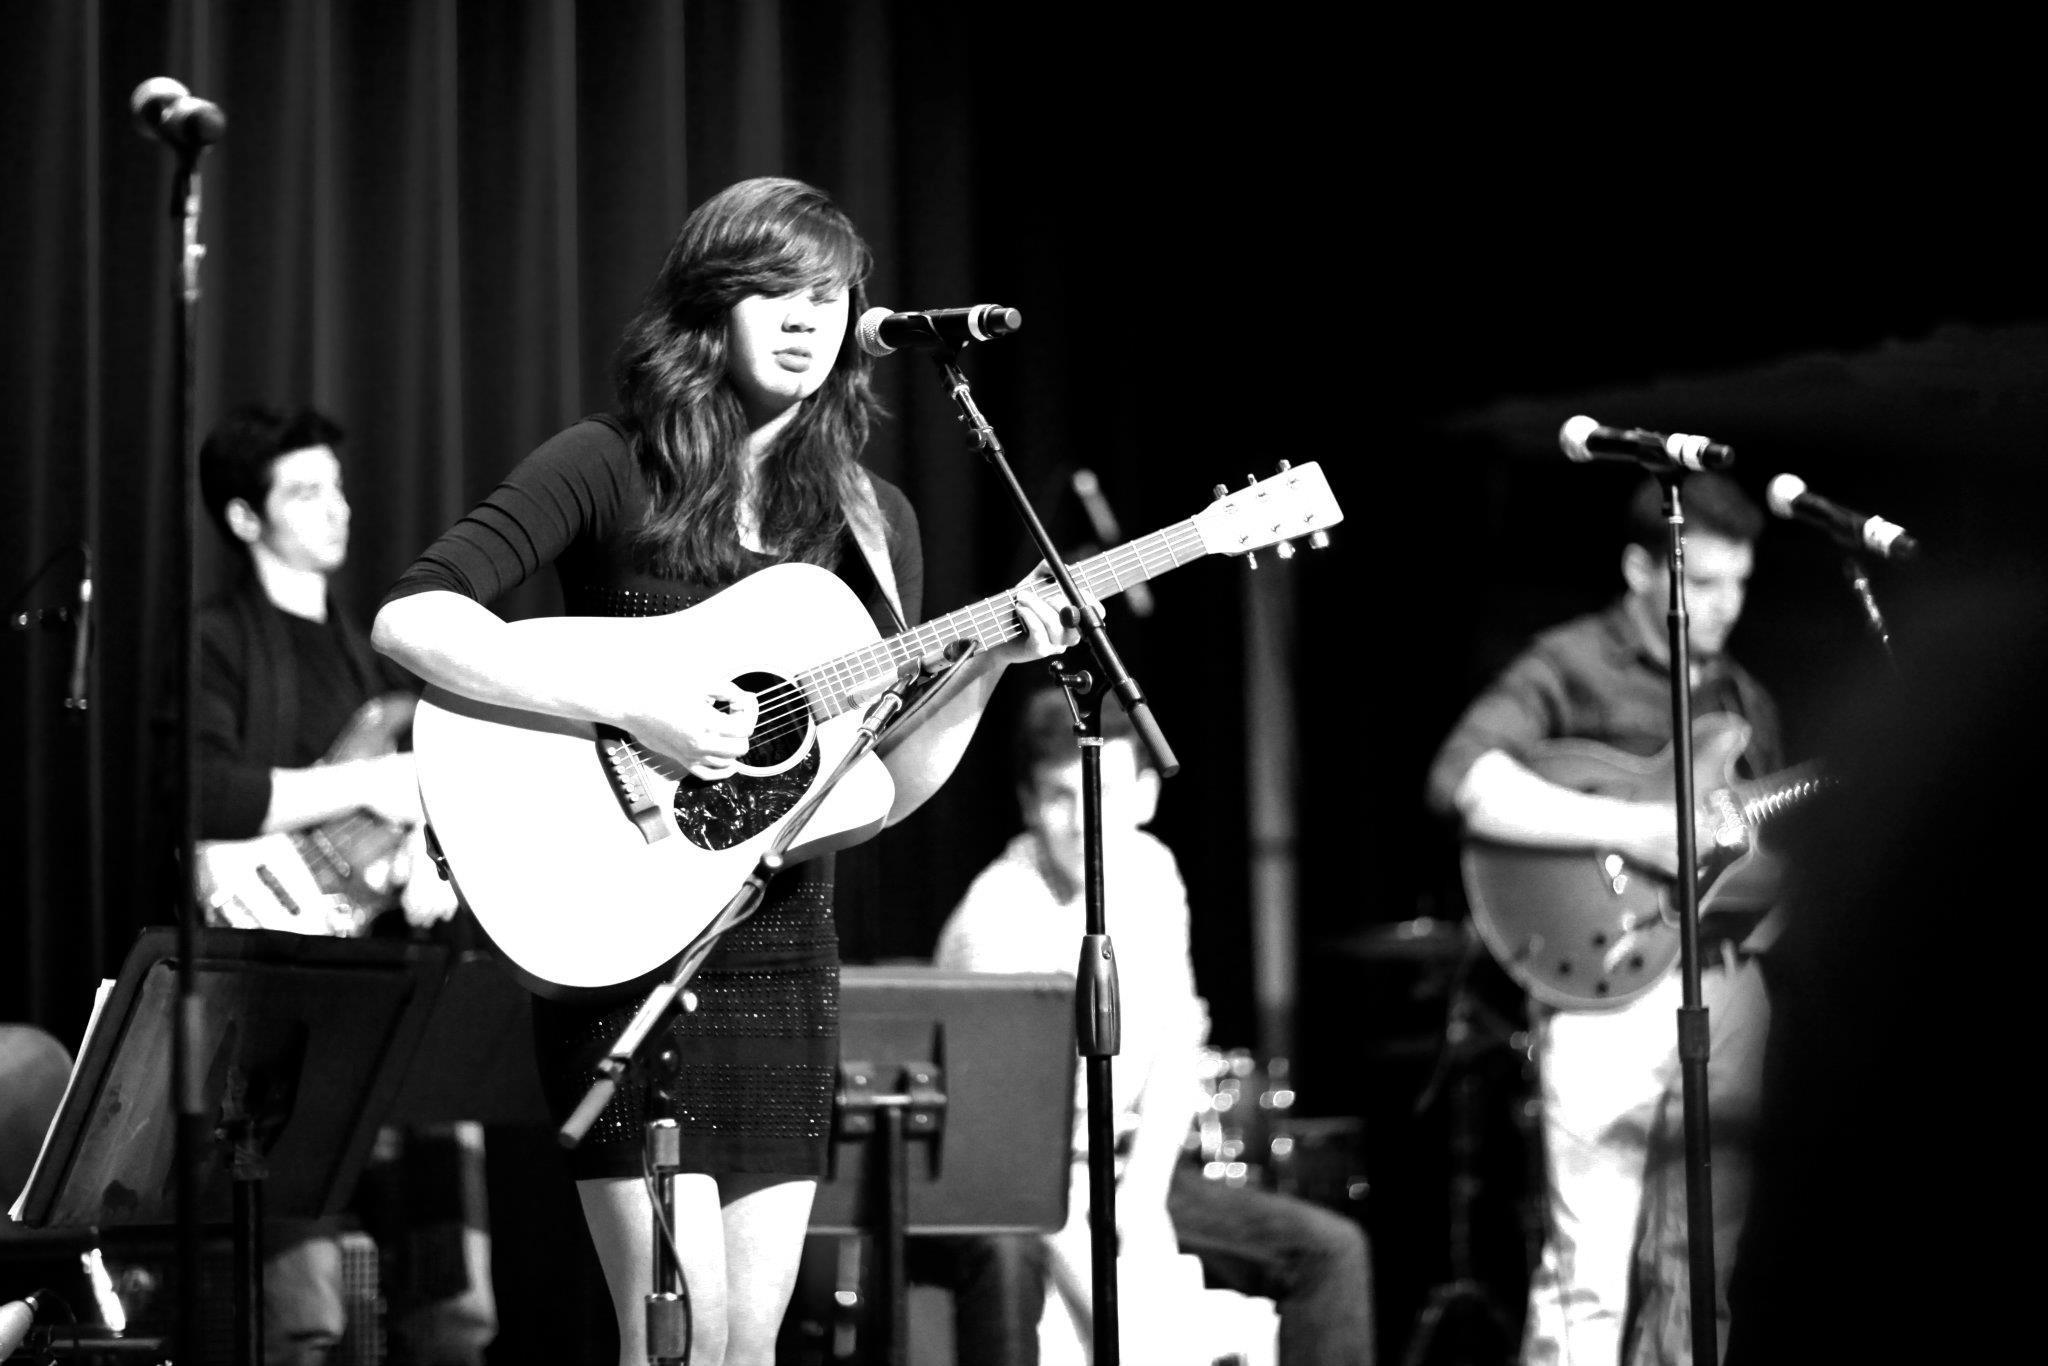 Berklee College of Music Songwriter's Showcase - Boston, MA  December 2011